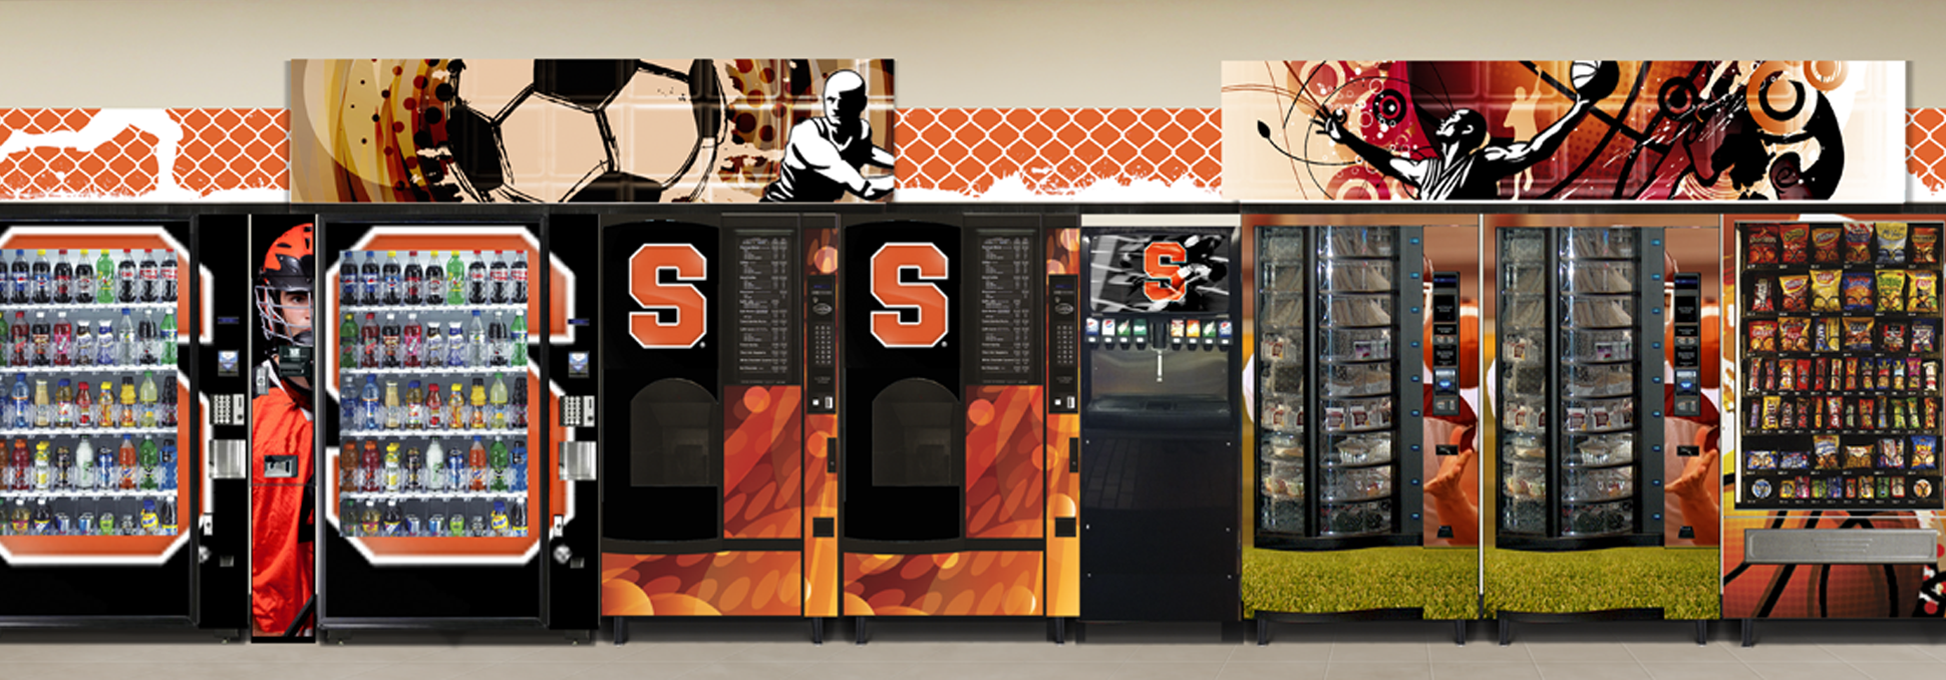 Syracuse University vending